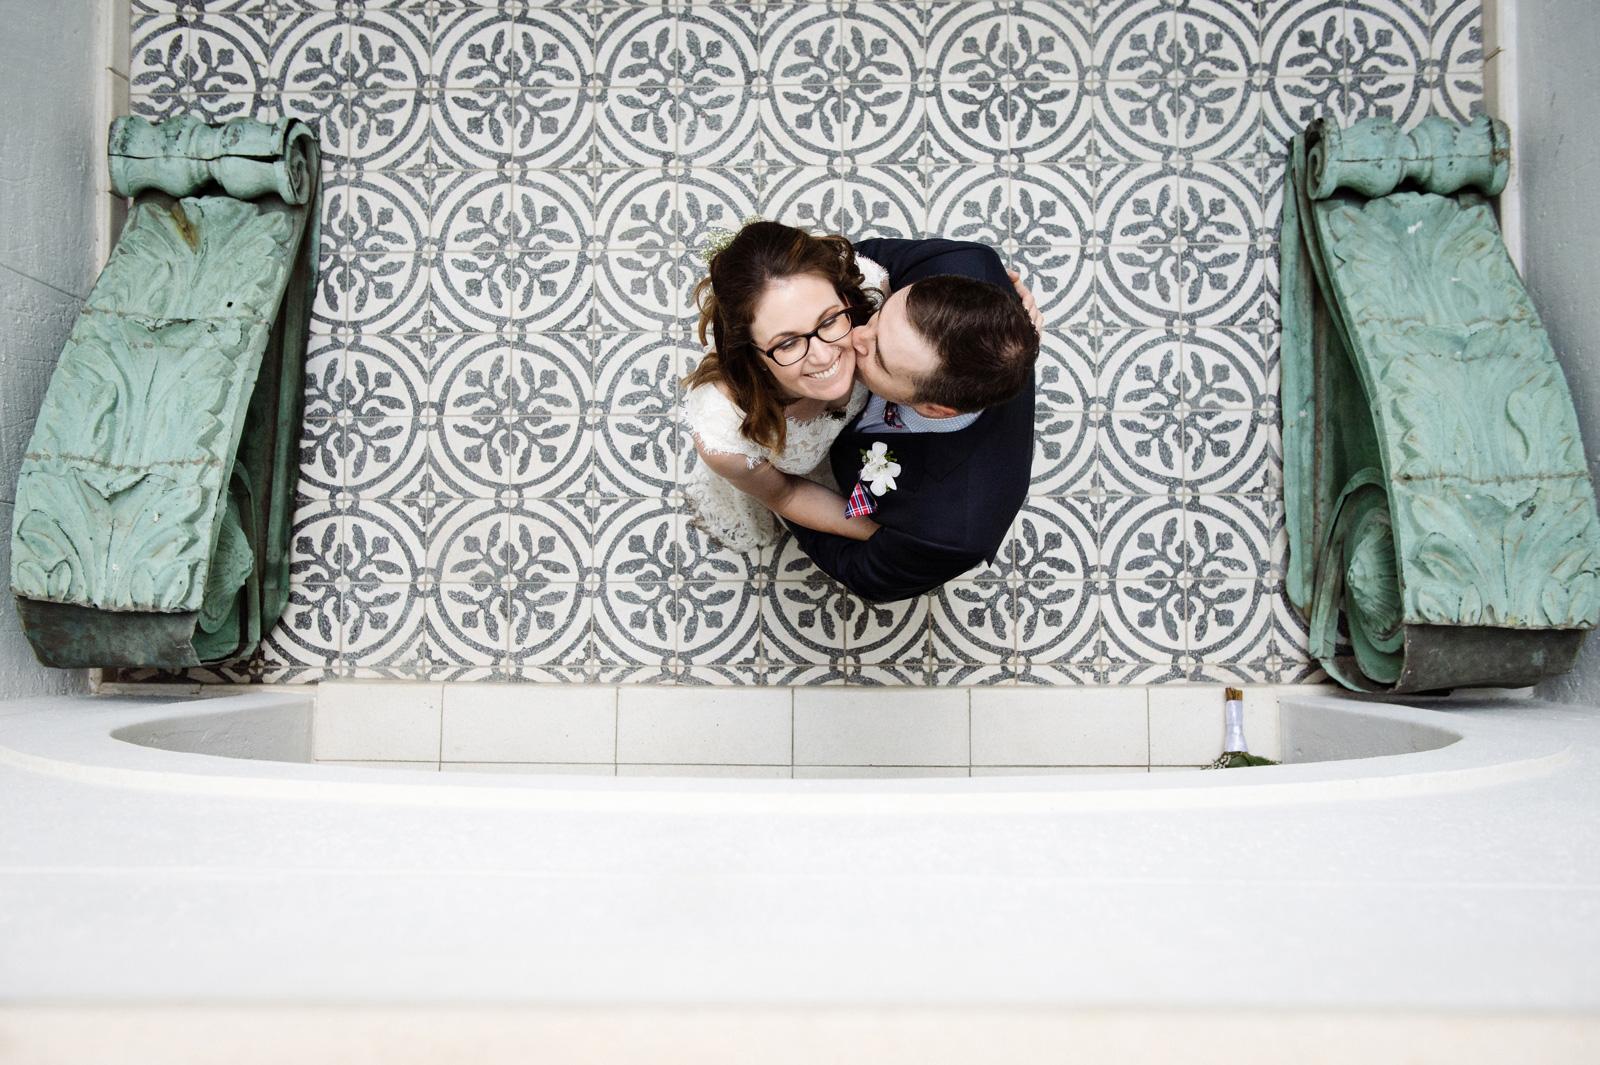 Bride and groom mosaic